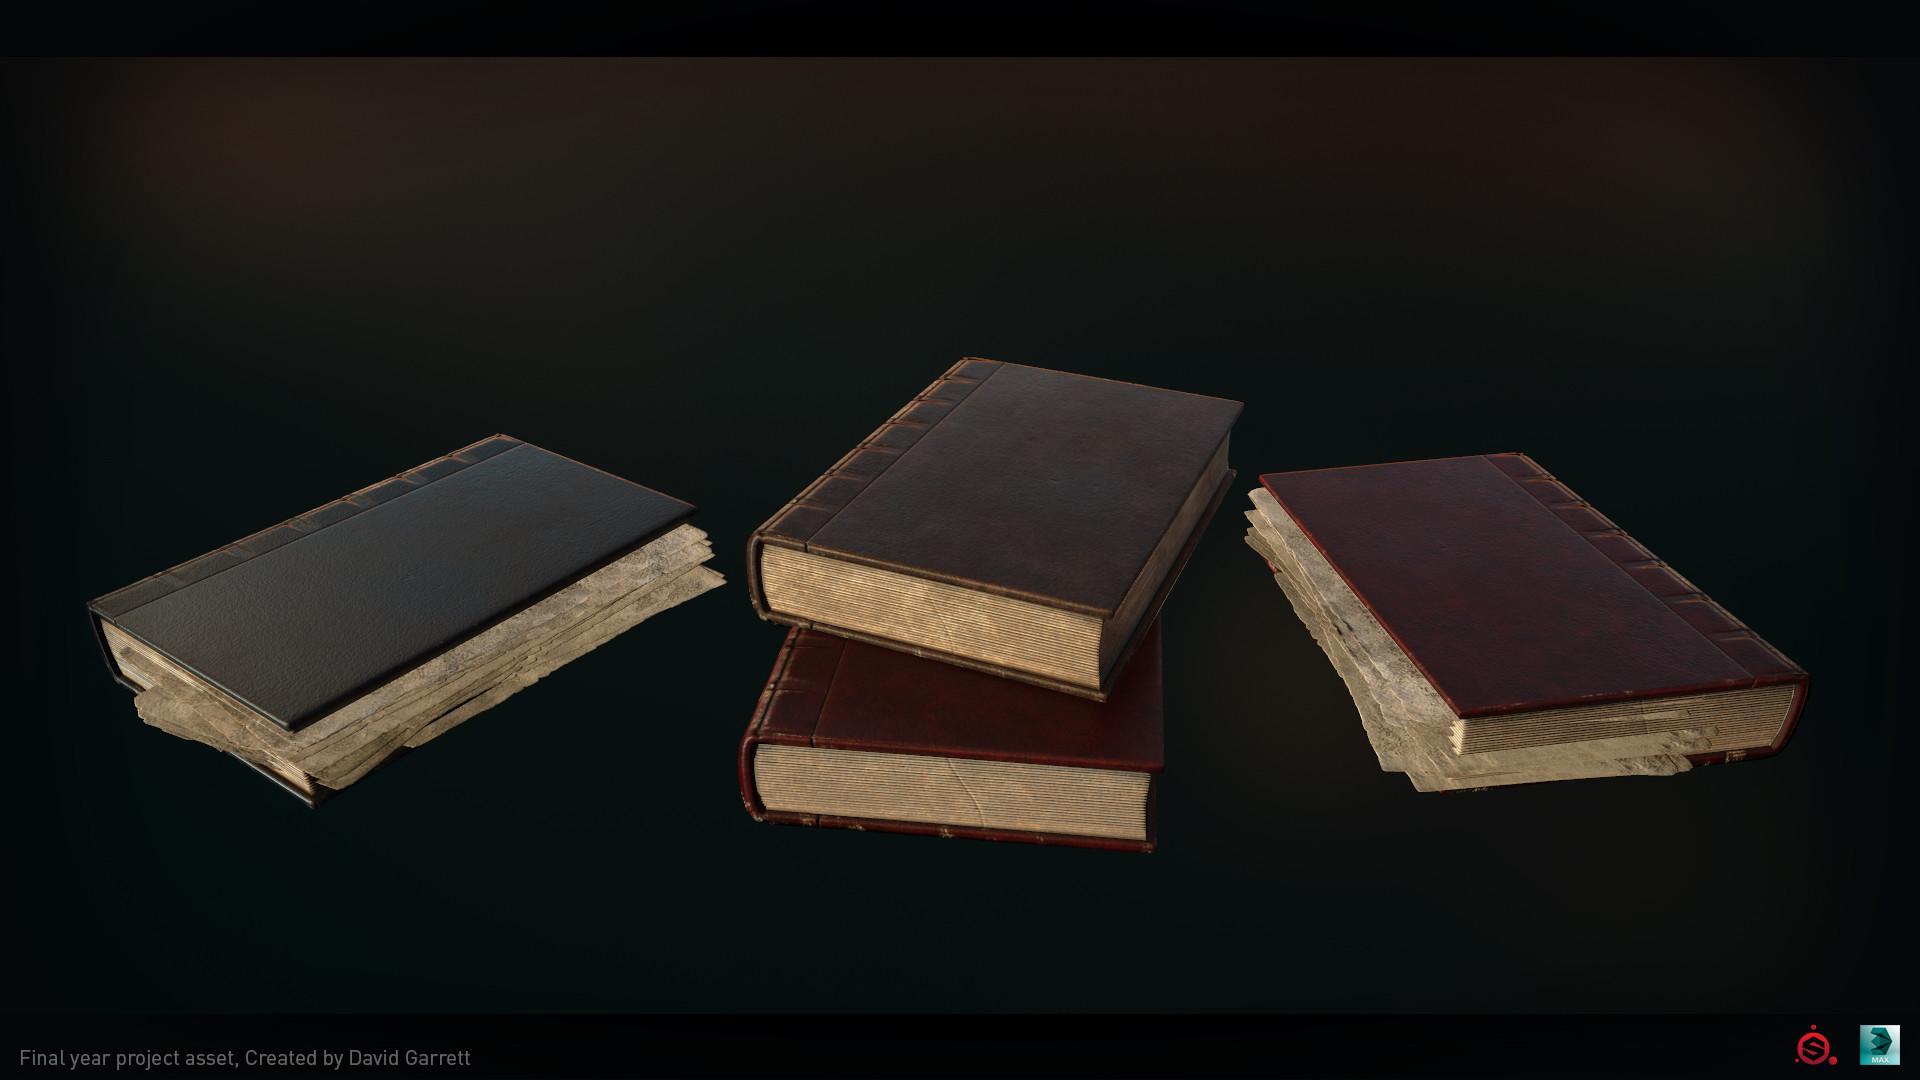 David garrett n3094311 asset shot books